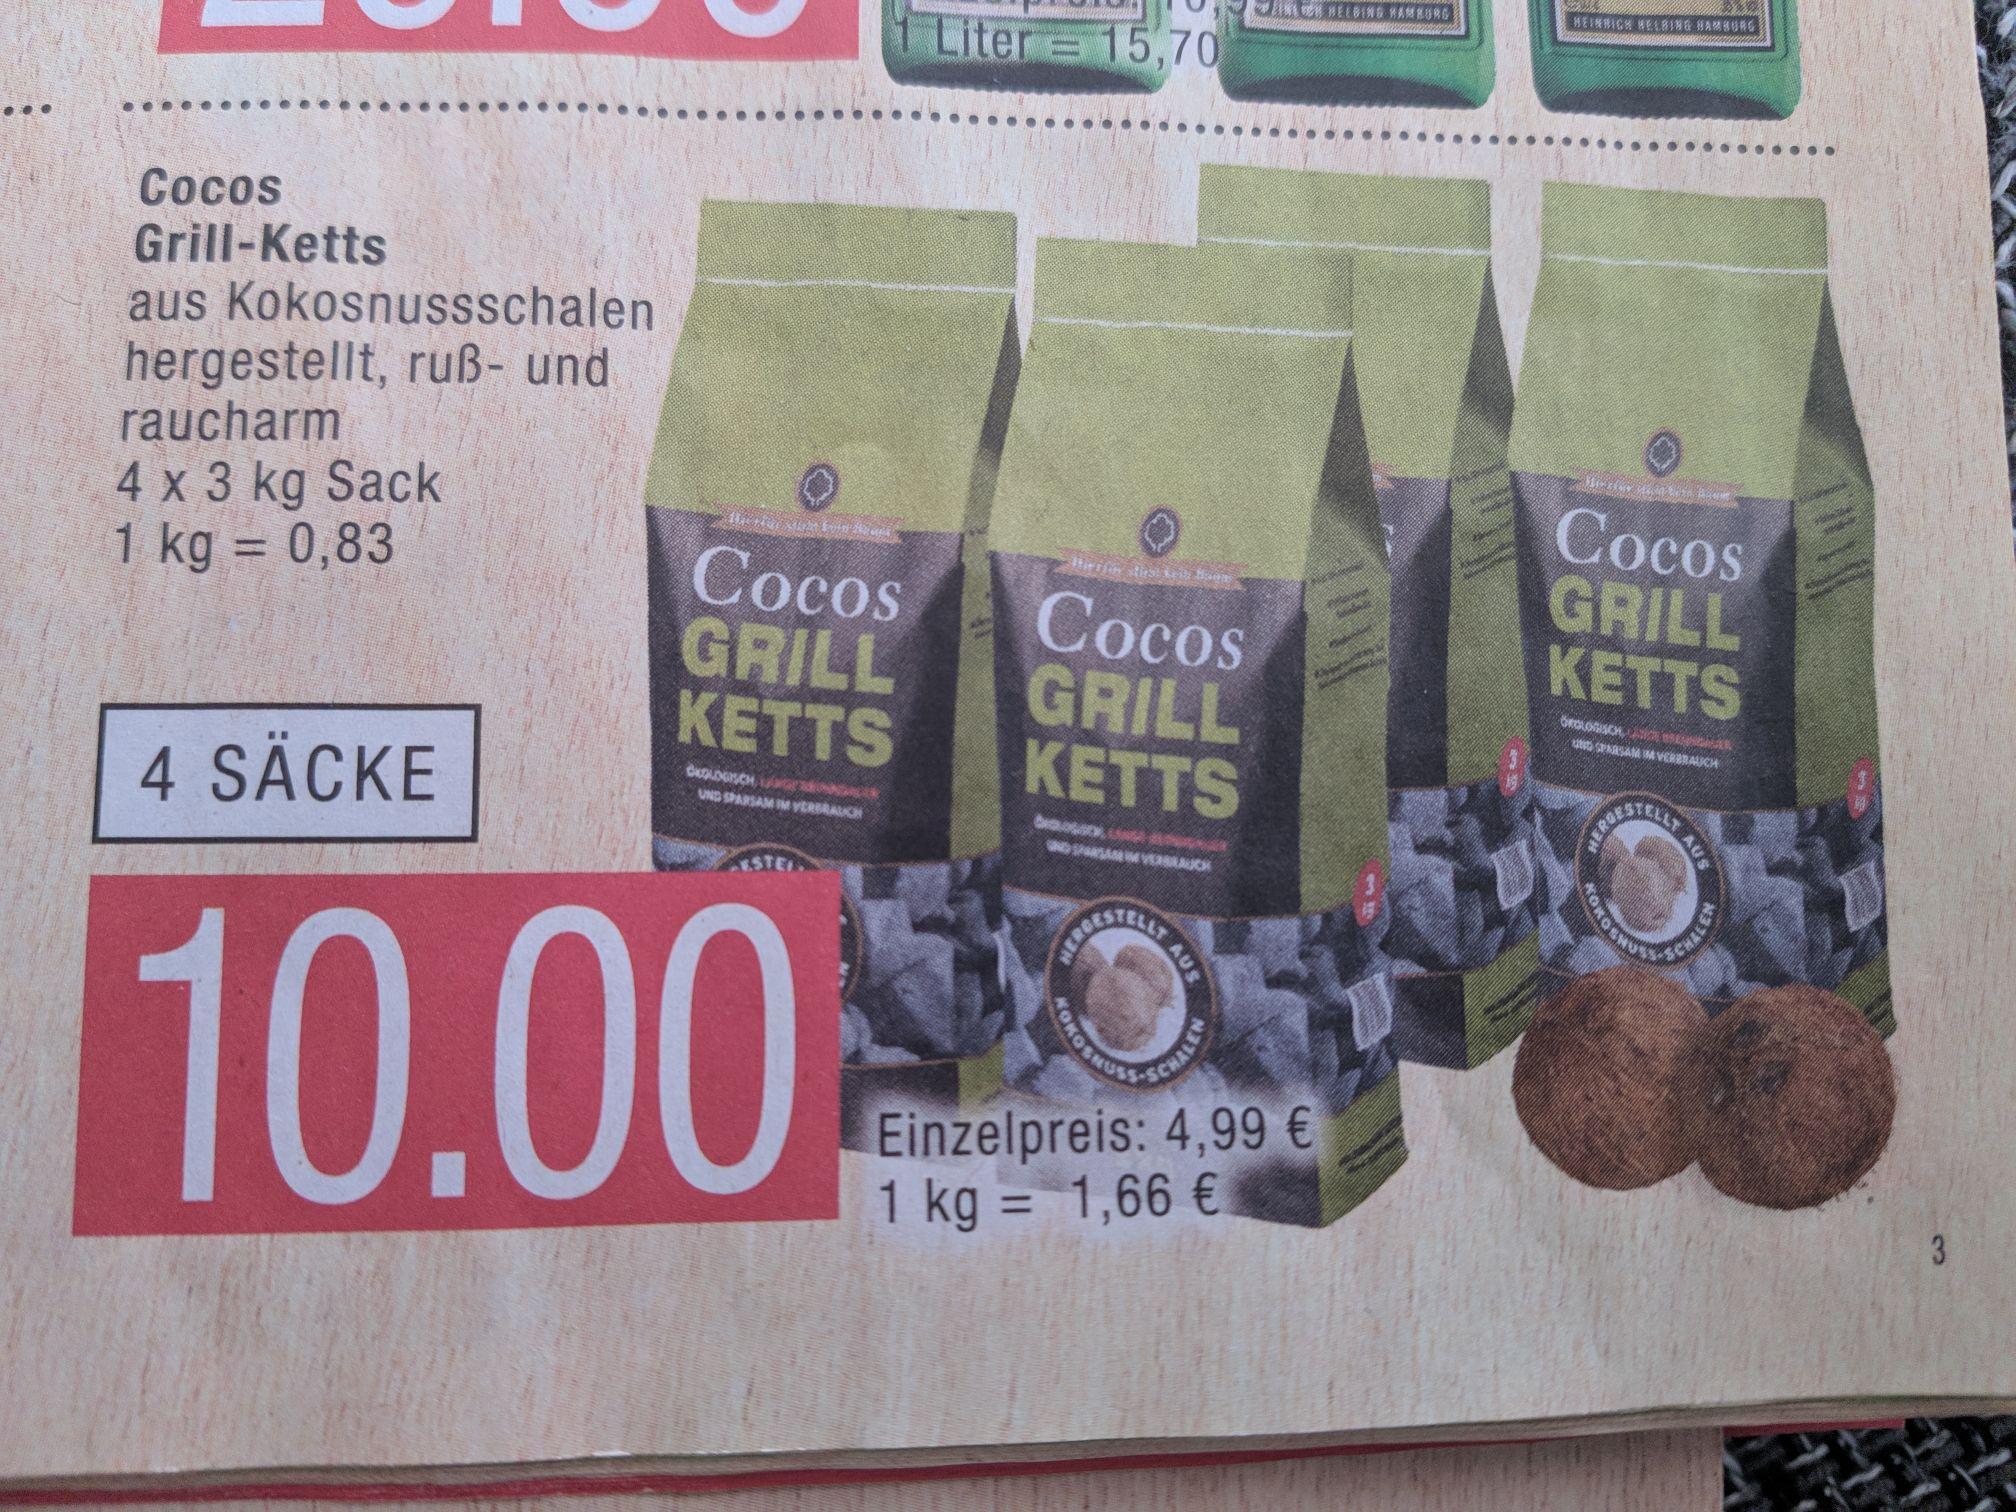 [Lokal] 12 kg Cocos Grill-Ketts für 10,- € Marktkauf HH & Umgebung